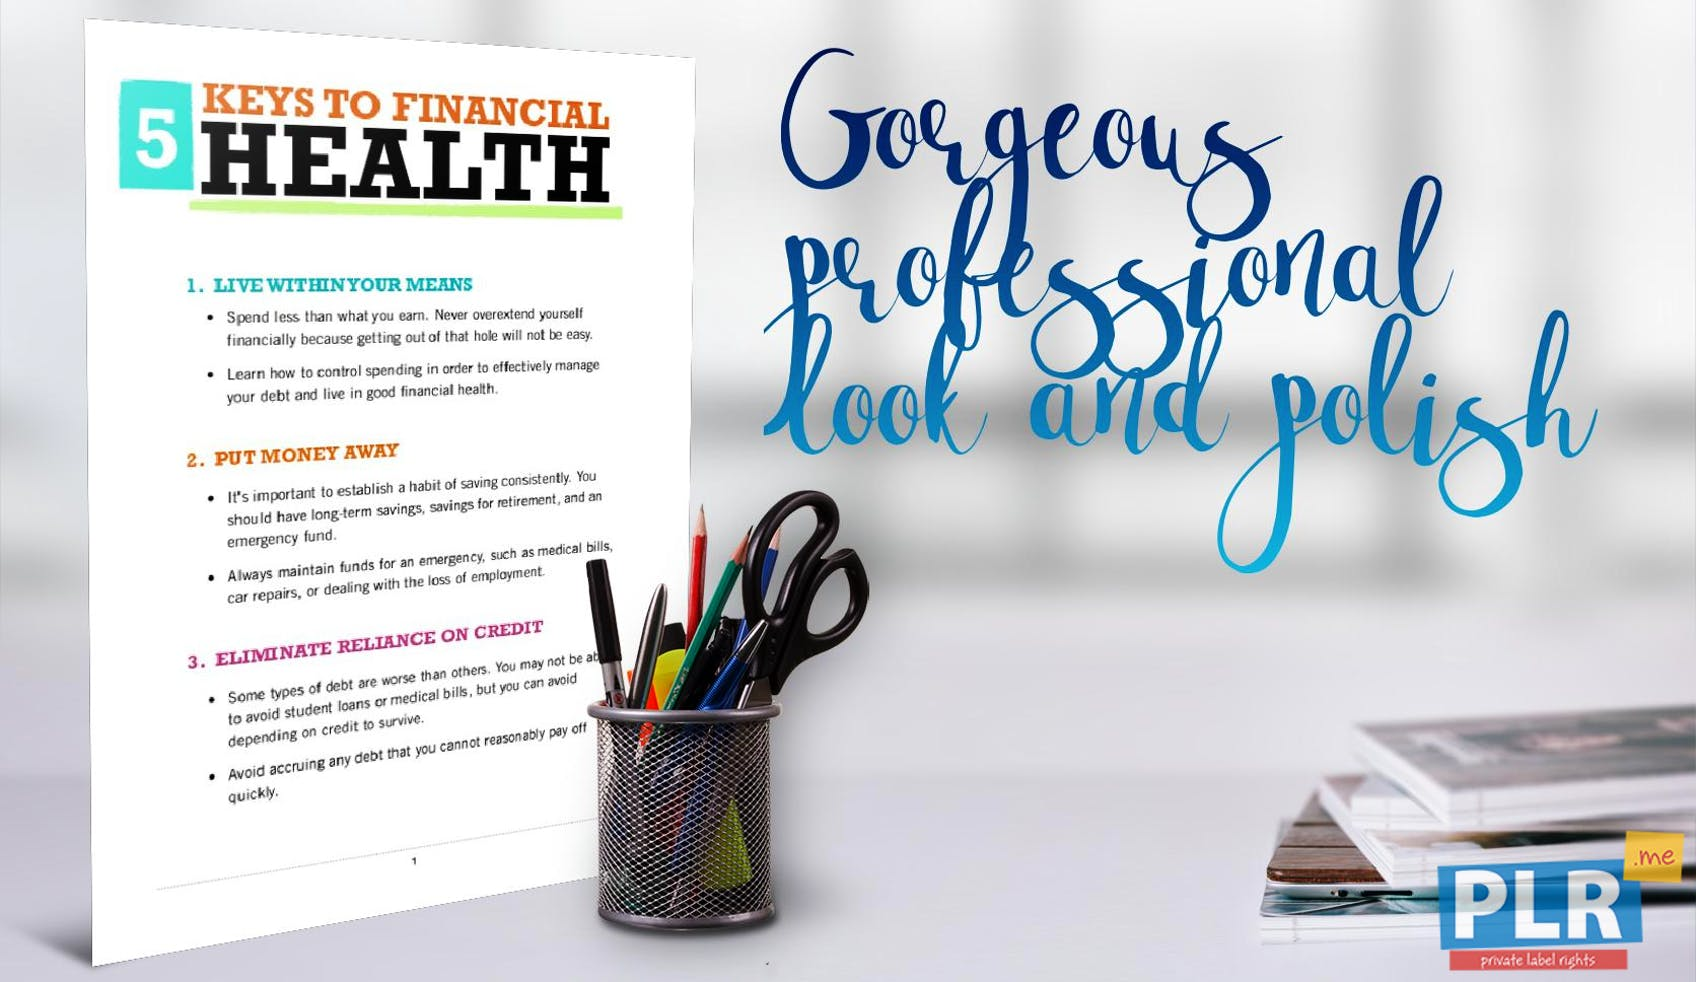 5 Keys To Financial Health